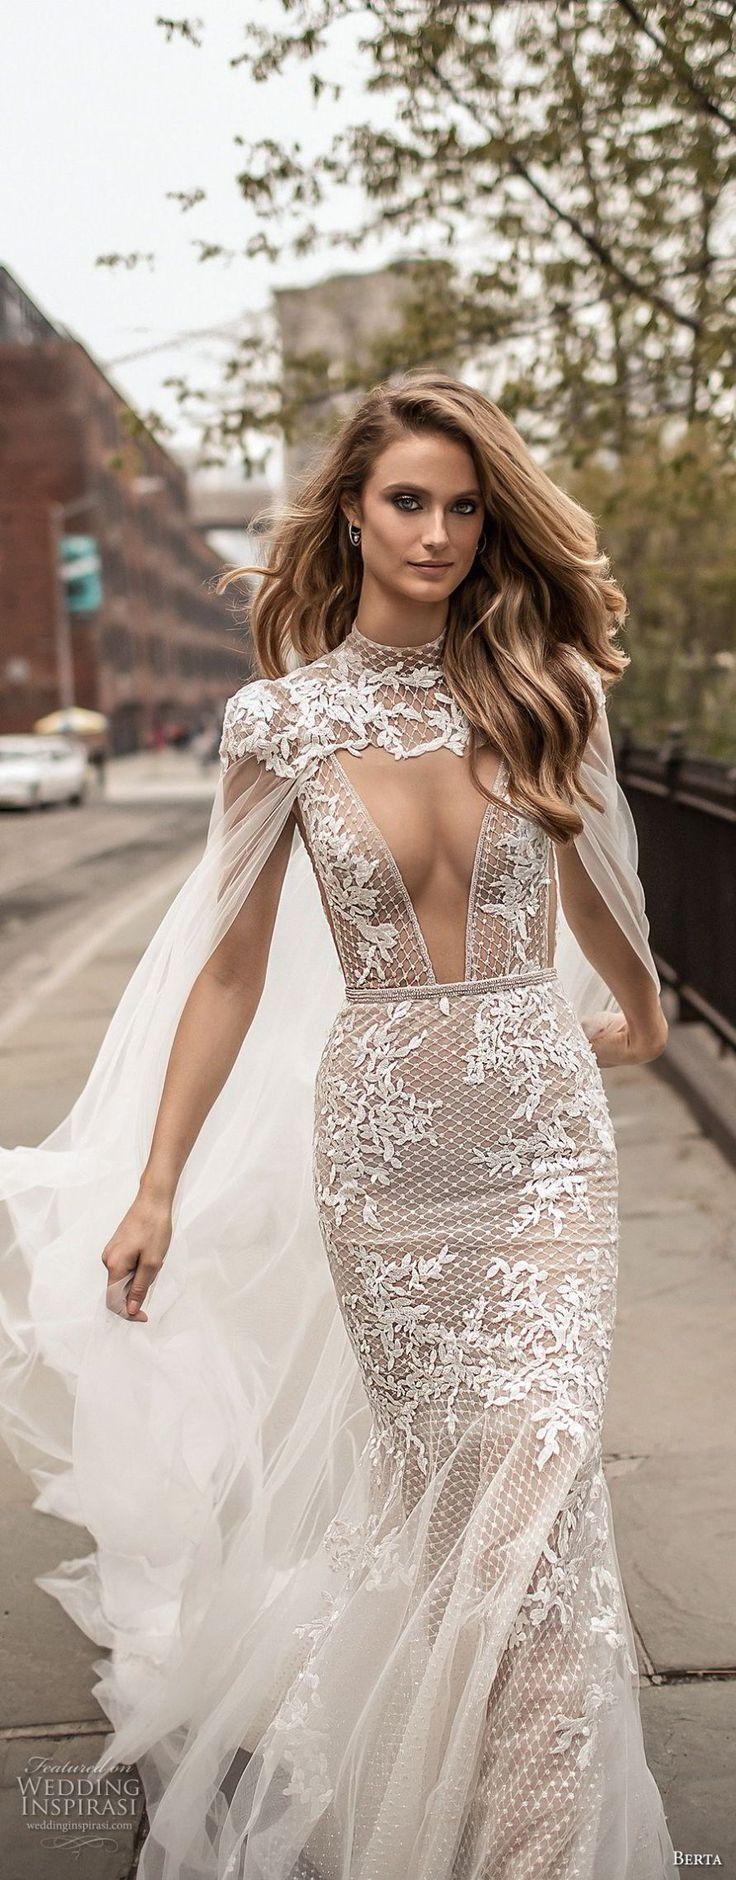 Mariage - Berta Bridal Spring 2018 Wedding Dresses – Part 2